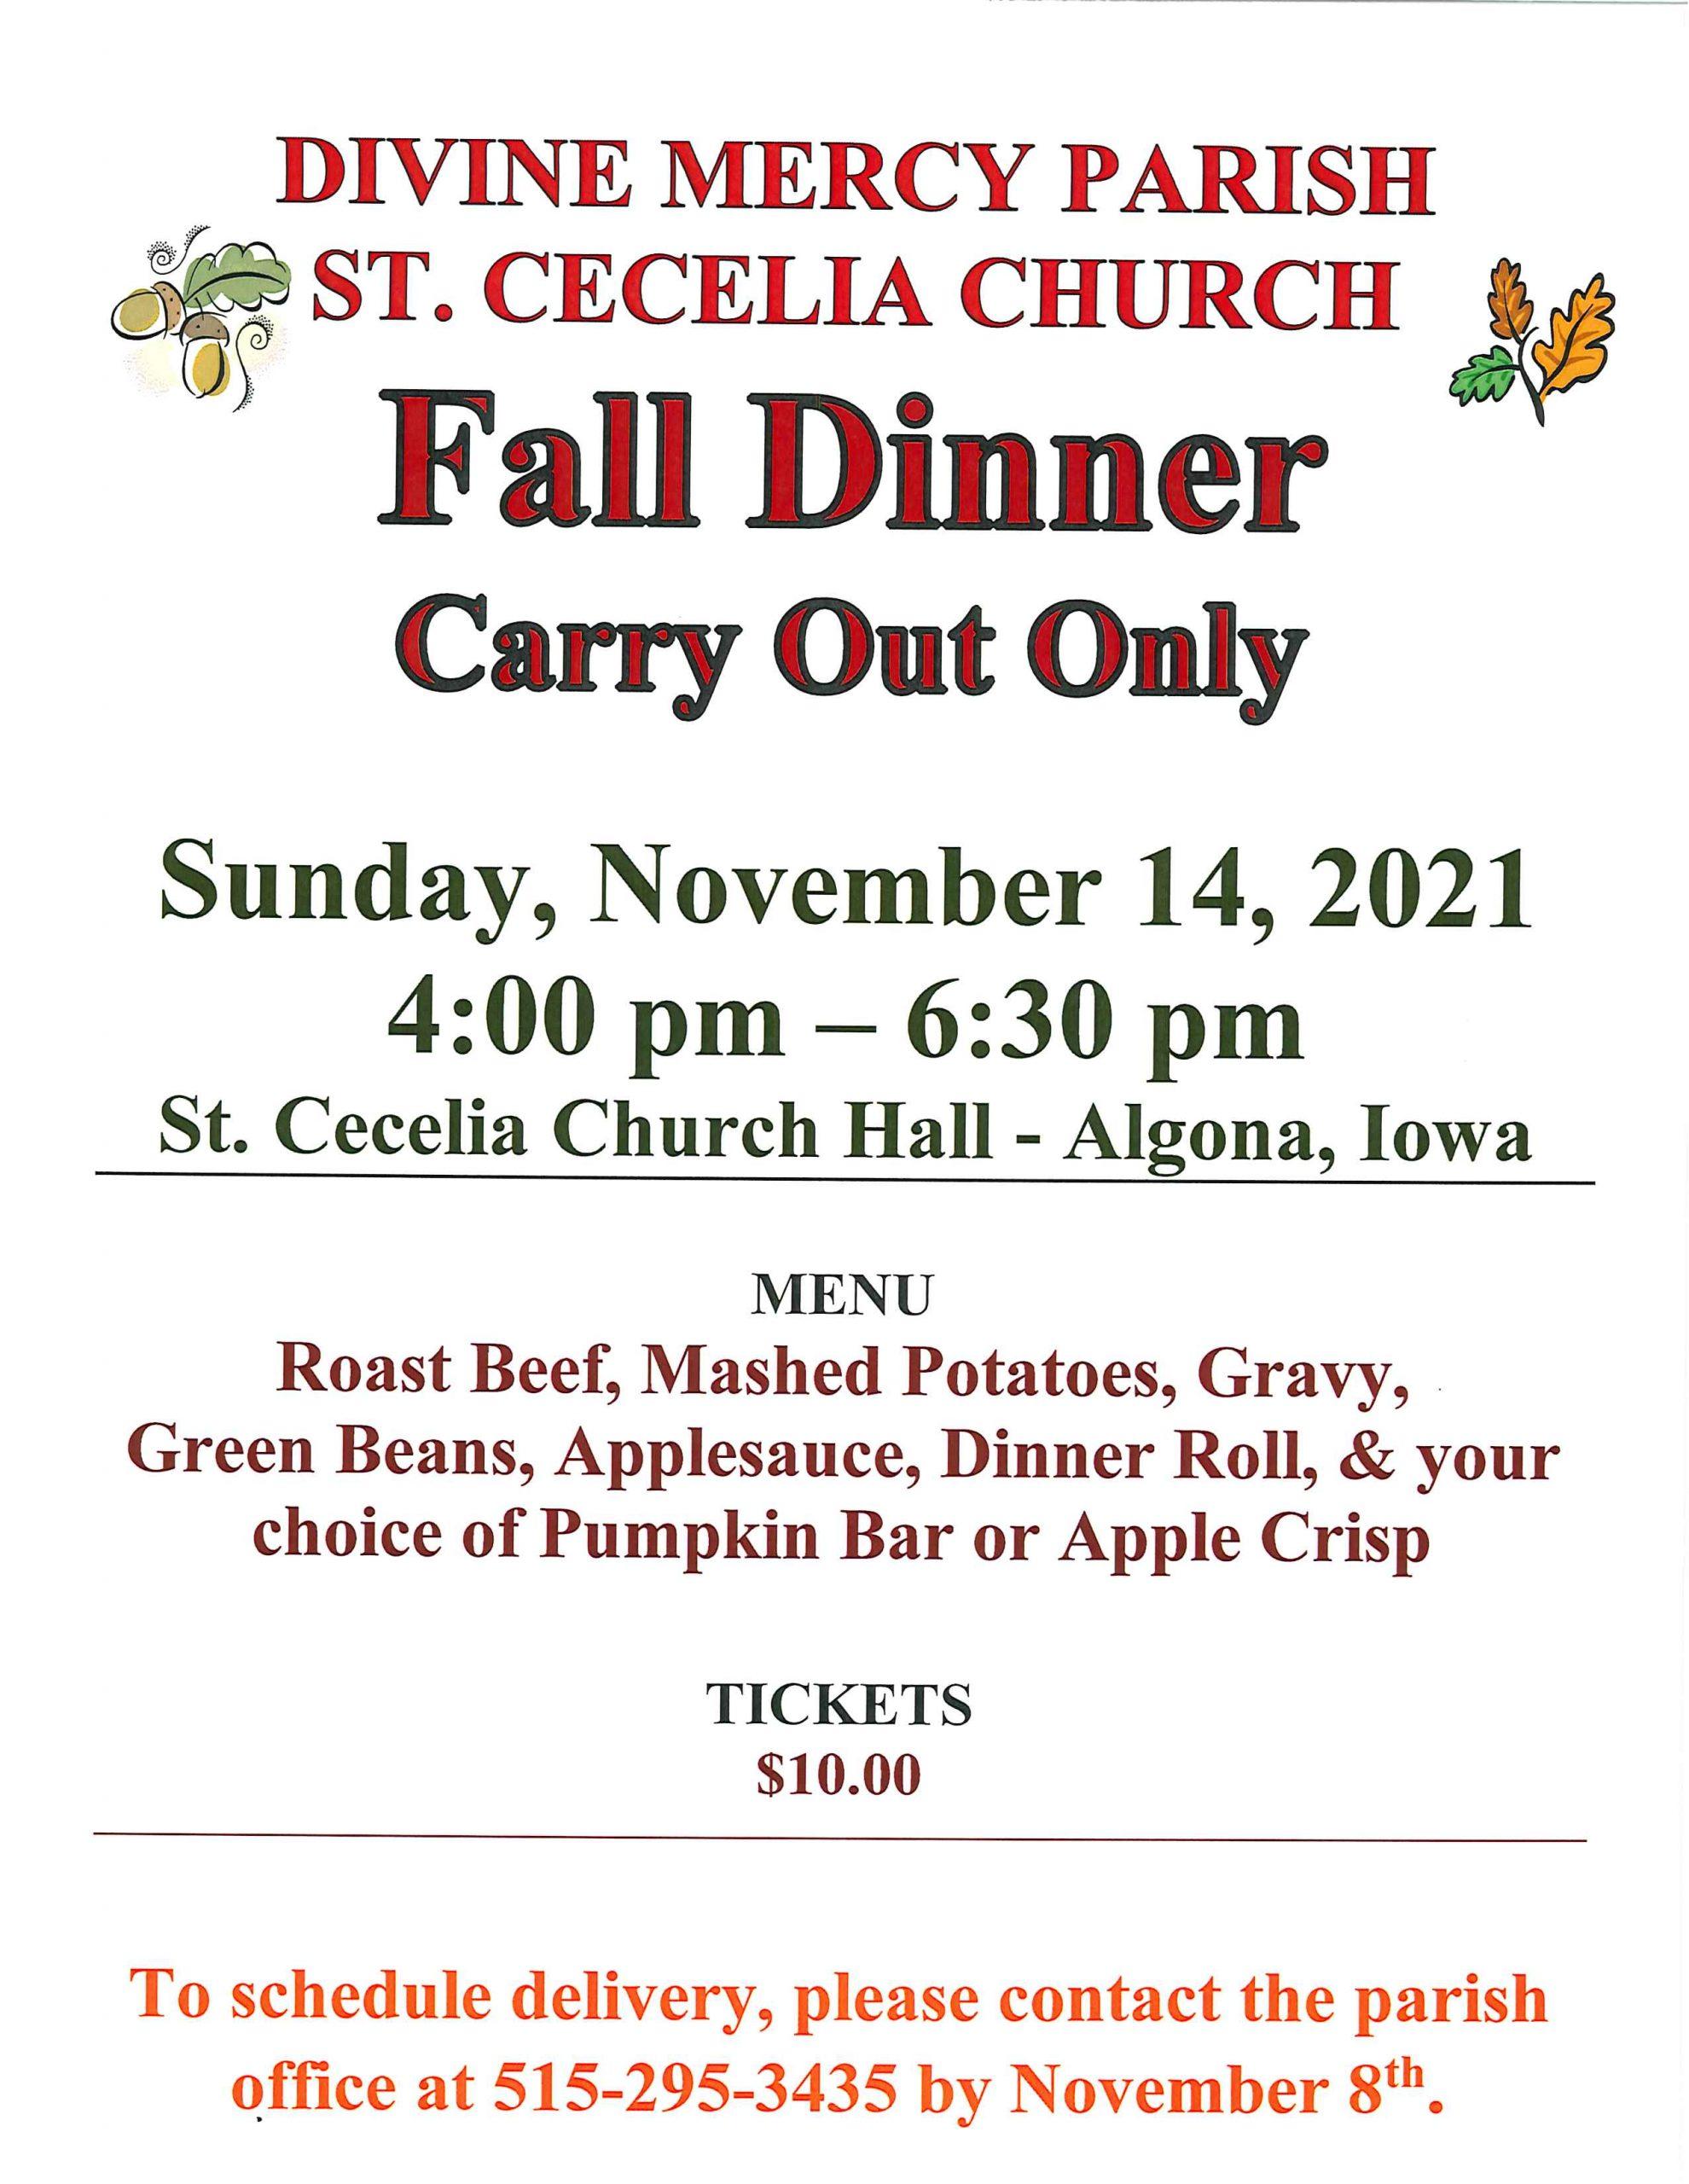 Divine Mercy Parish St. Cecelia Church Fall Dinner